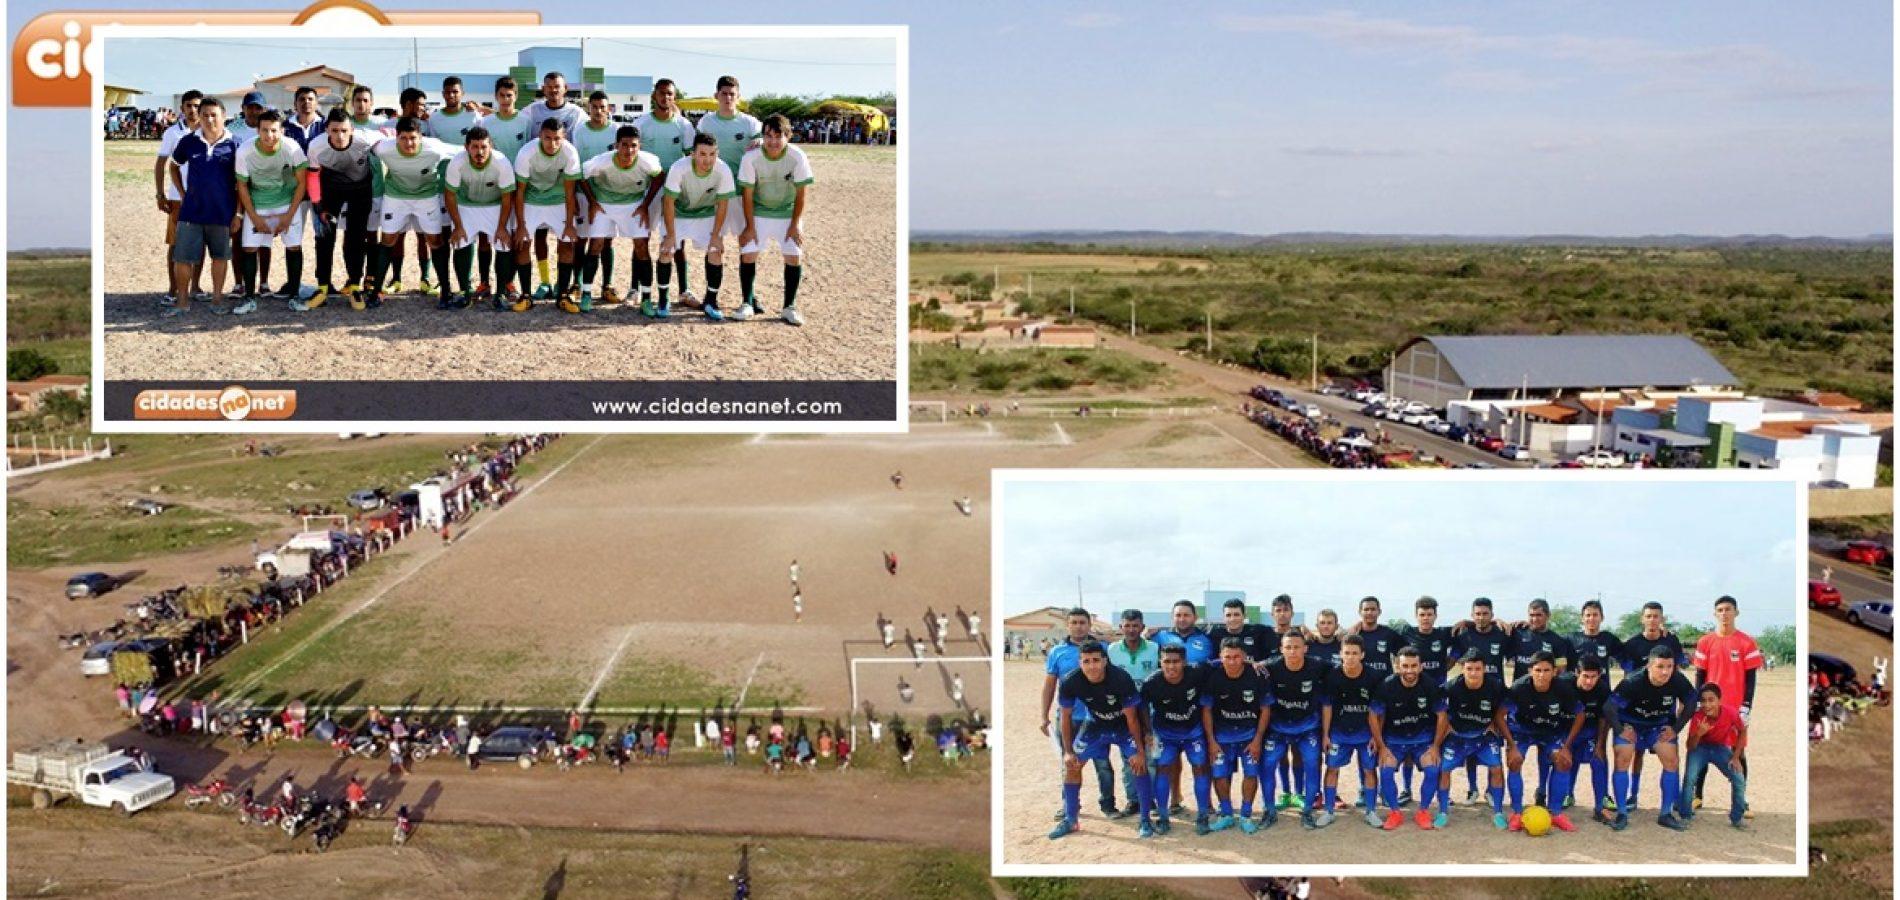 ALEGRETE 26 ANOS   Final do Campeonato de Futebol acontece na sexta (27); confira os finalistas